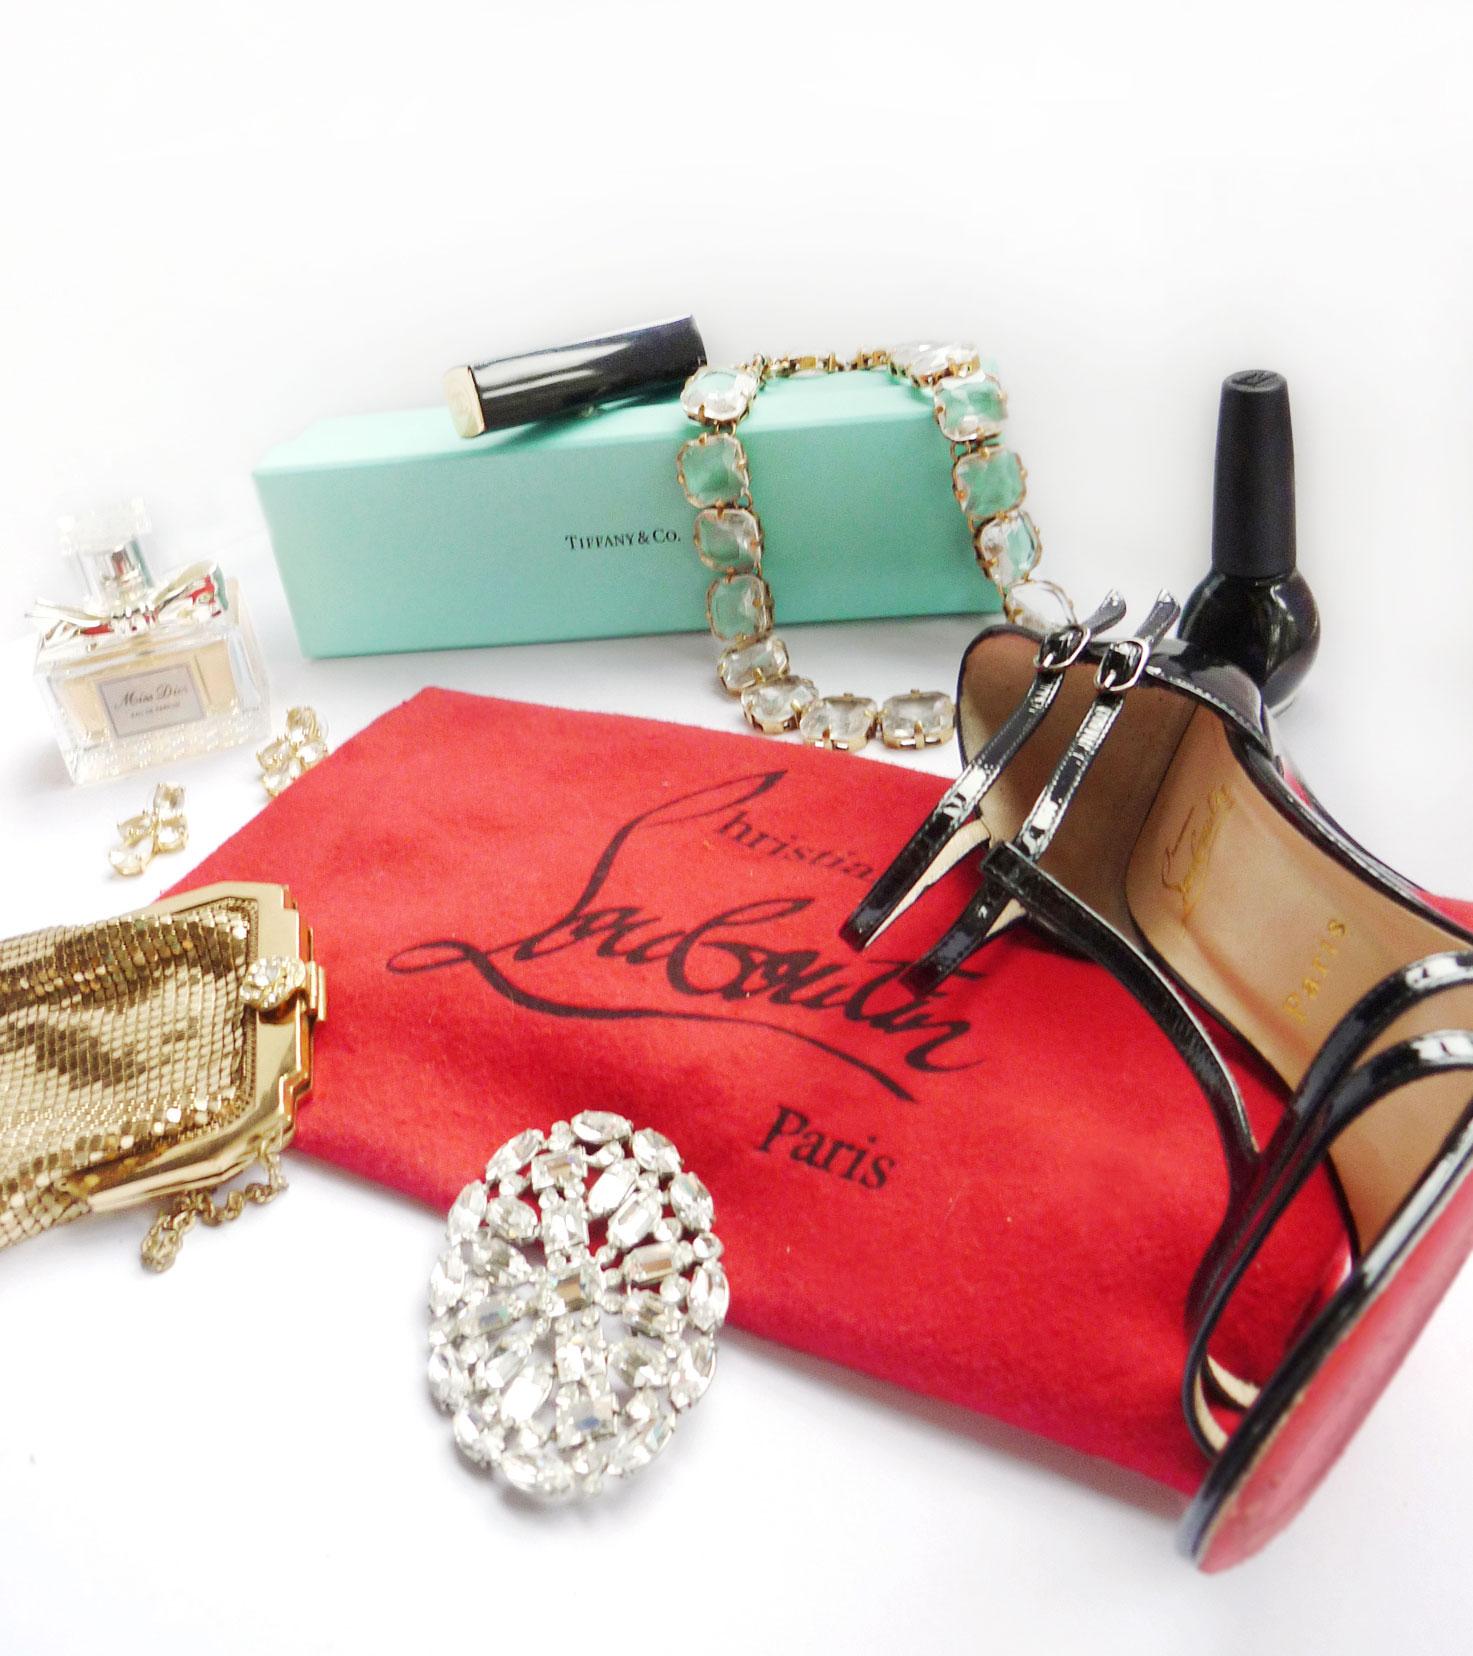 Fashion-Jewerly-Shoes-Perfume-Grouping-1.jpg